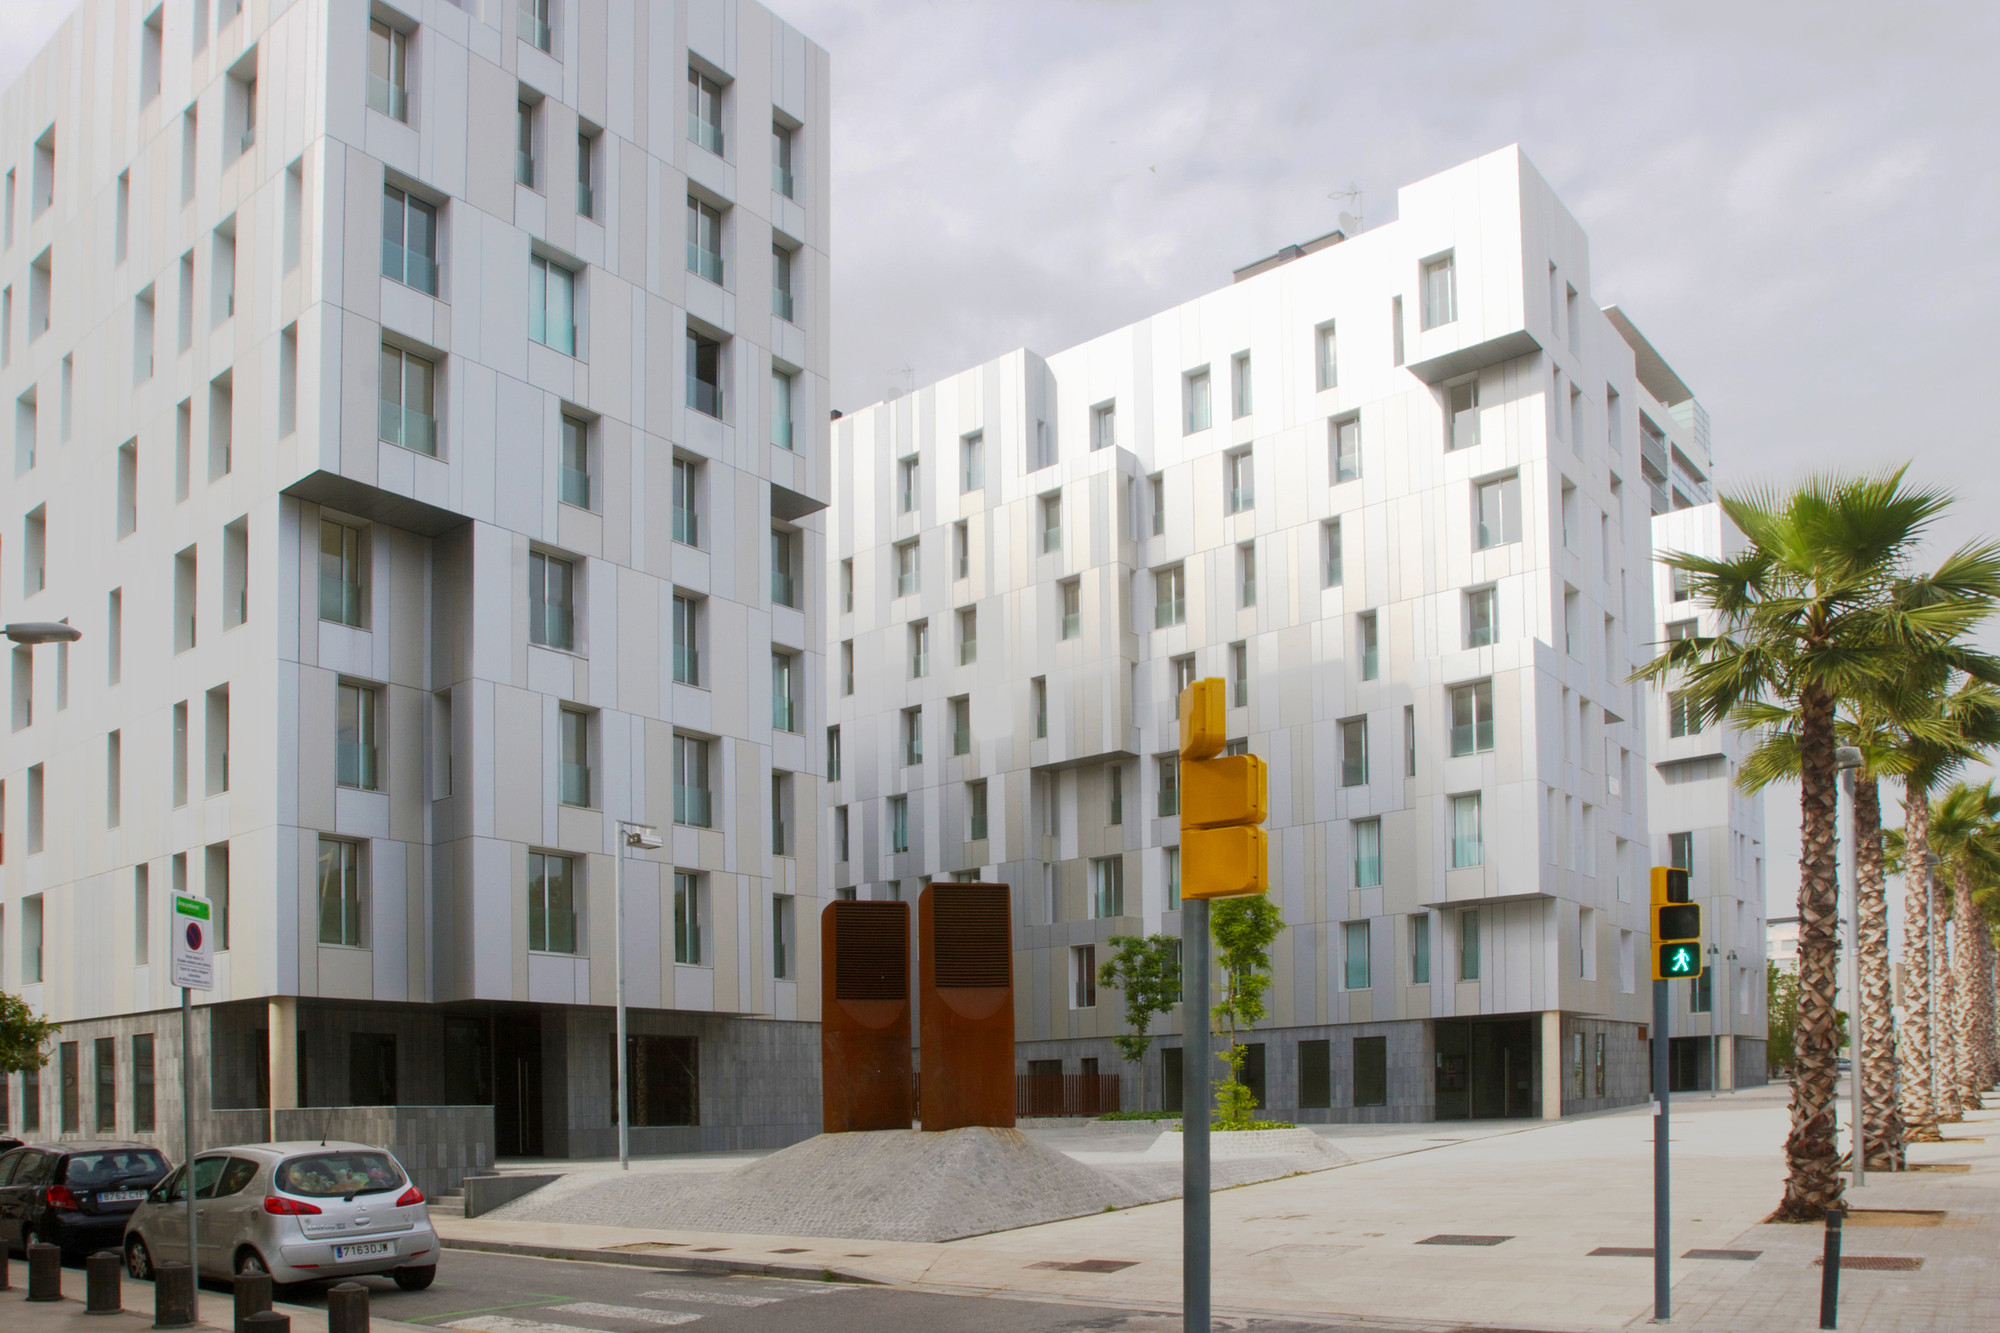 Triton Building / Saeta Estudi + Lluís Cantallops  + Juan Domingo, Courtesy of Saeta estudi